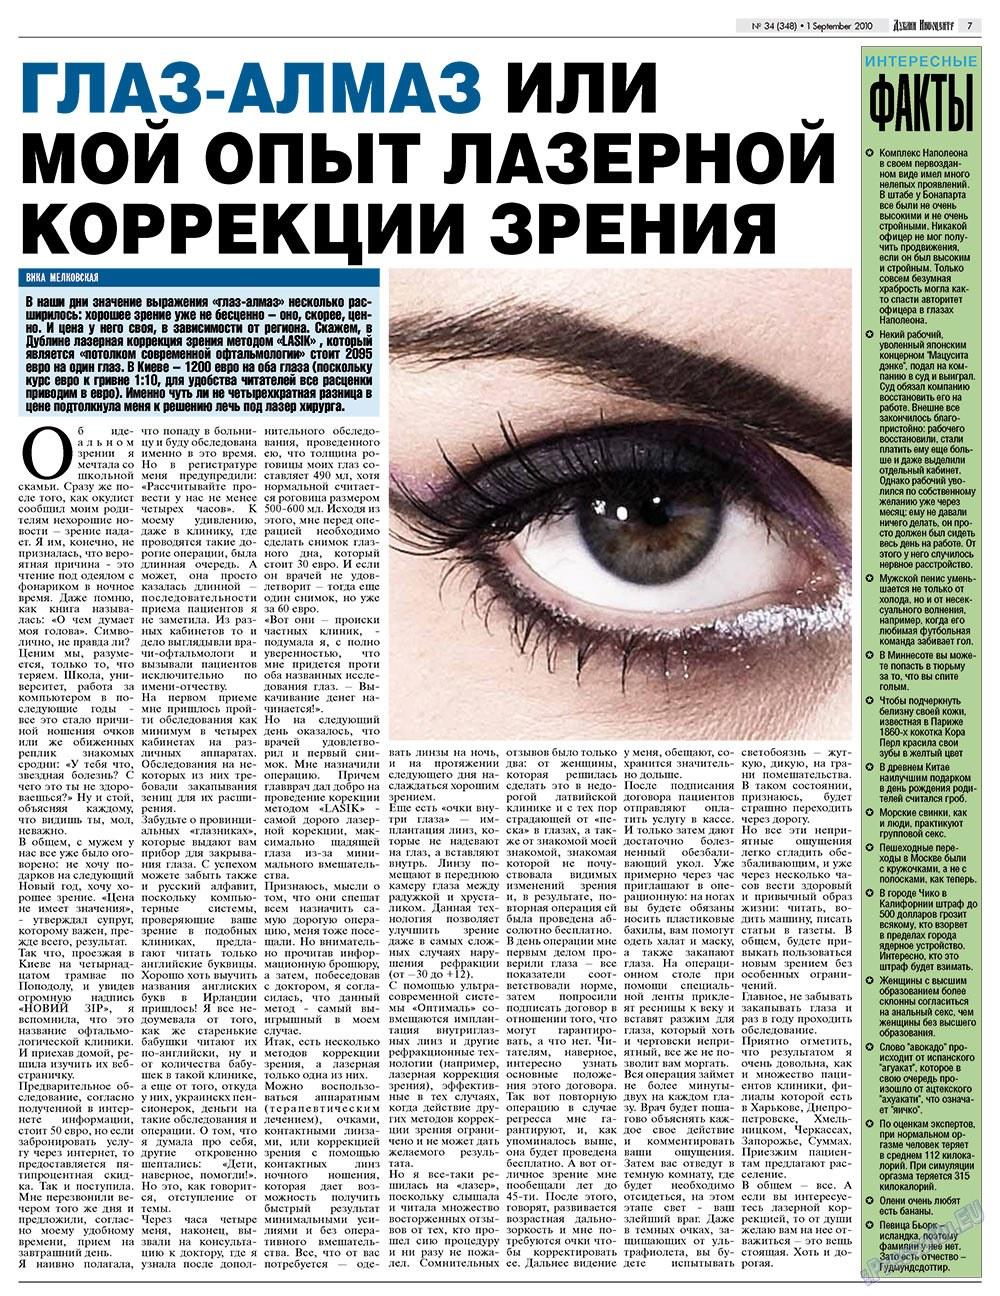 Дублин инфоцентр (газета). 2010 год, номер 34, стр. 7